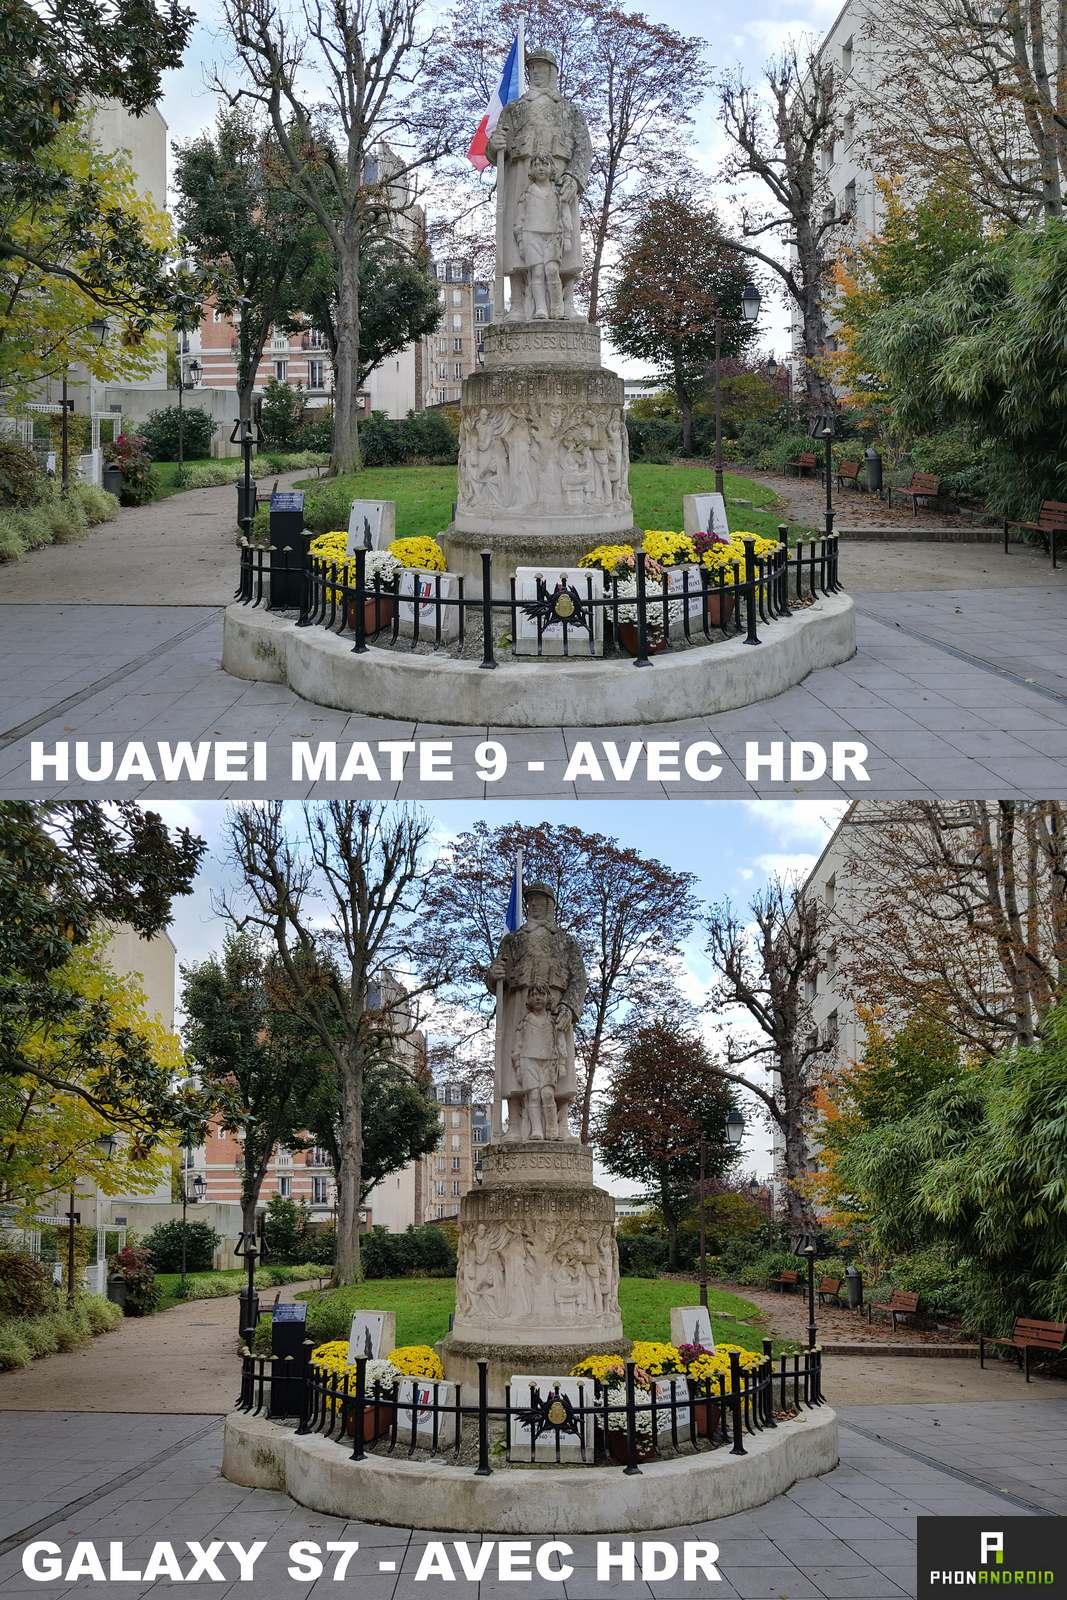 huawei mate 9 galaxy s7 photo hdr